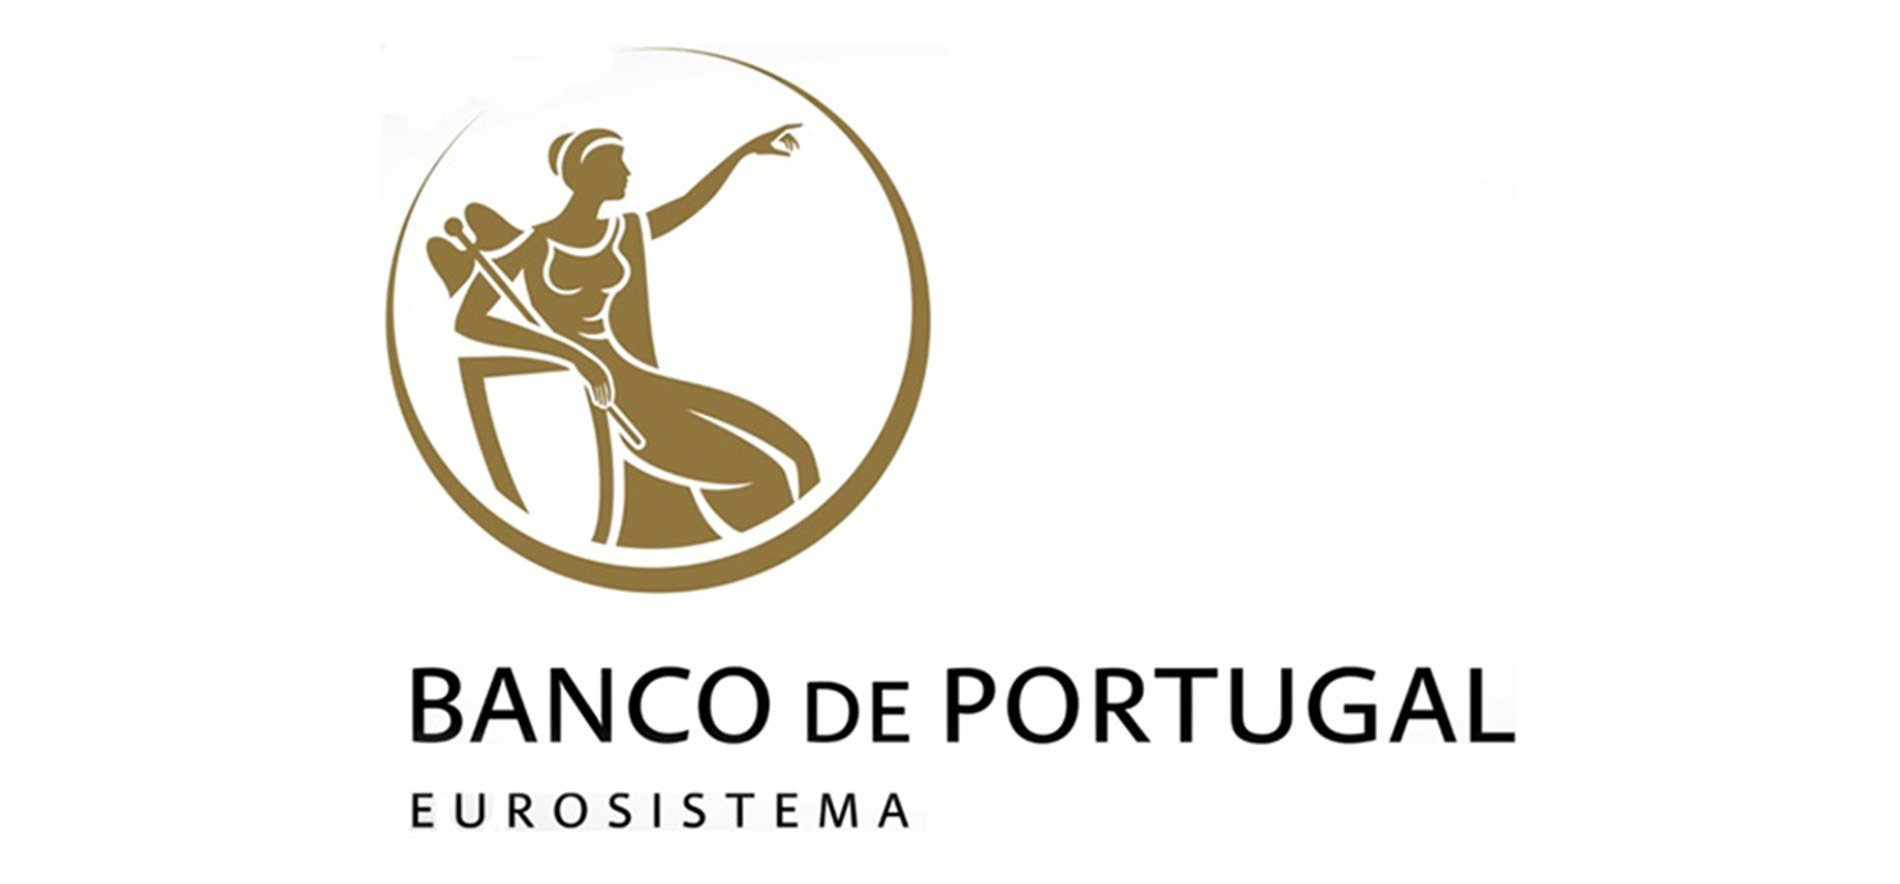 G3 Banco de portugal